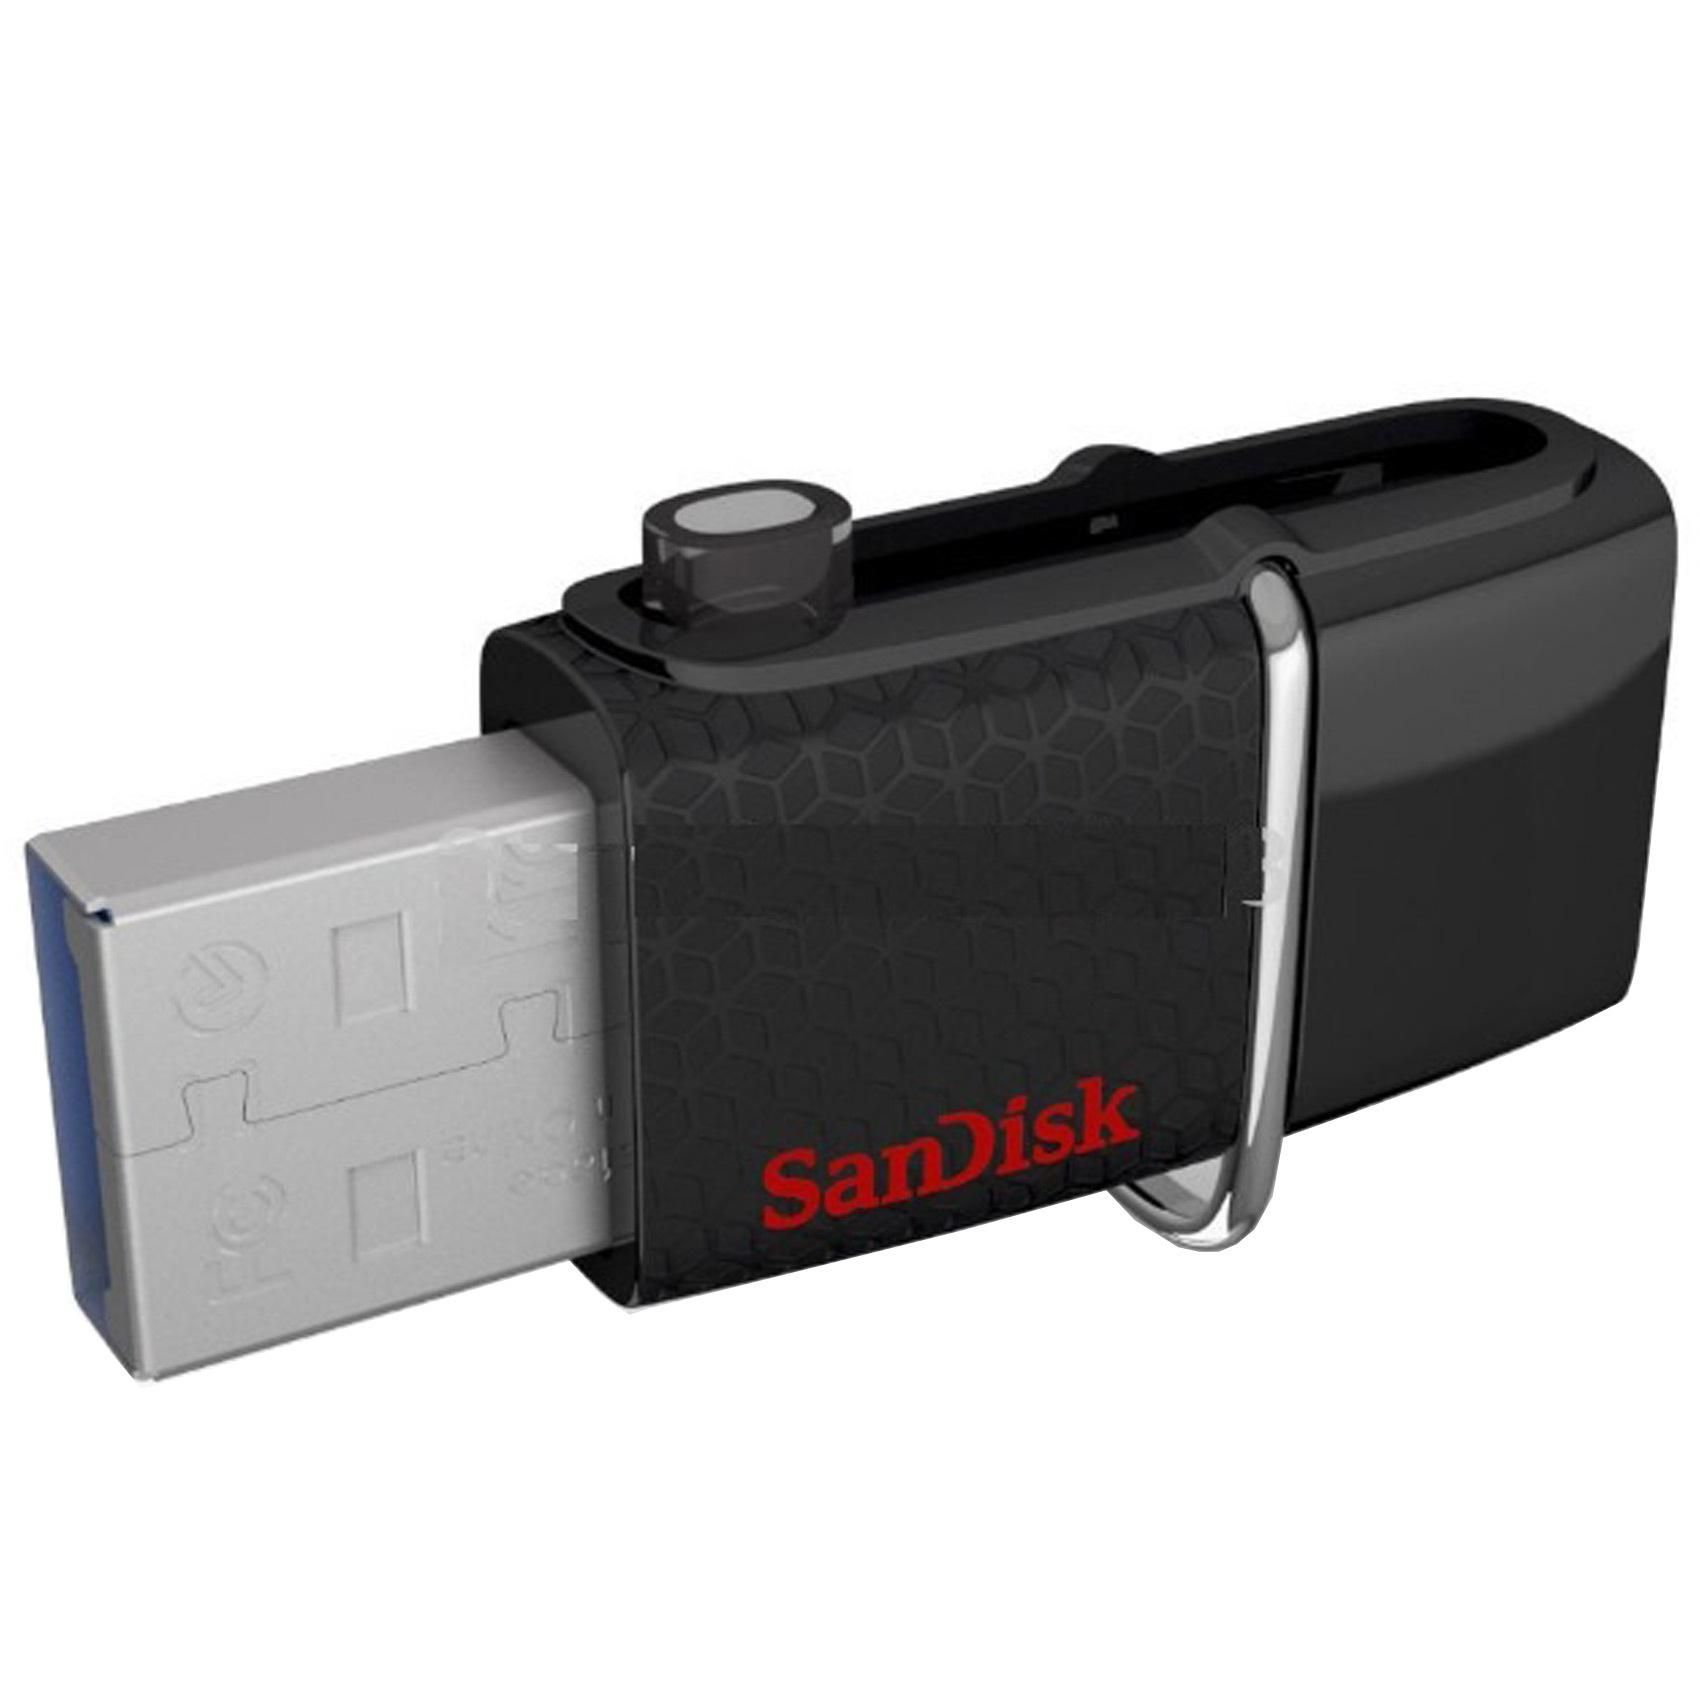 SANDISK OTG DUAL DR ULTRA ANDR 64GB